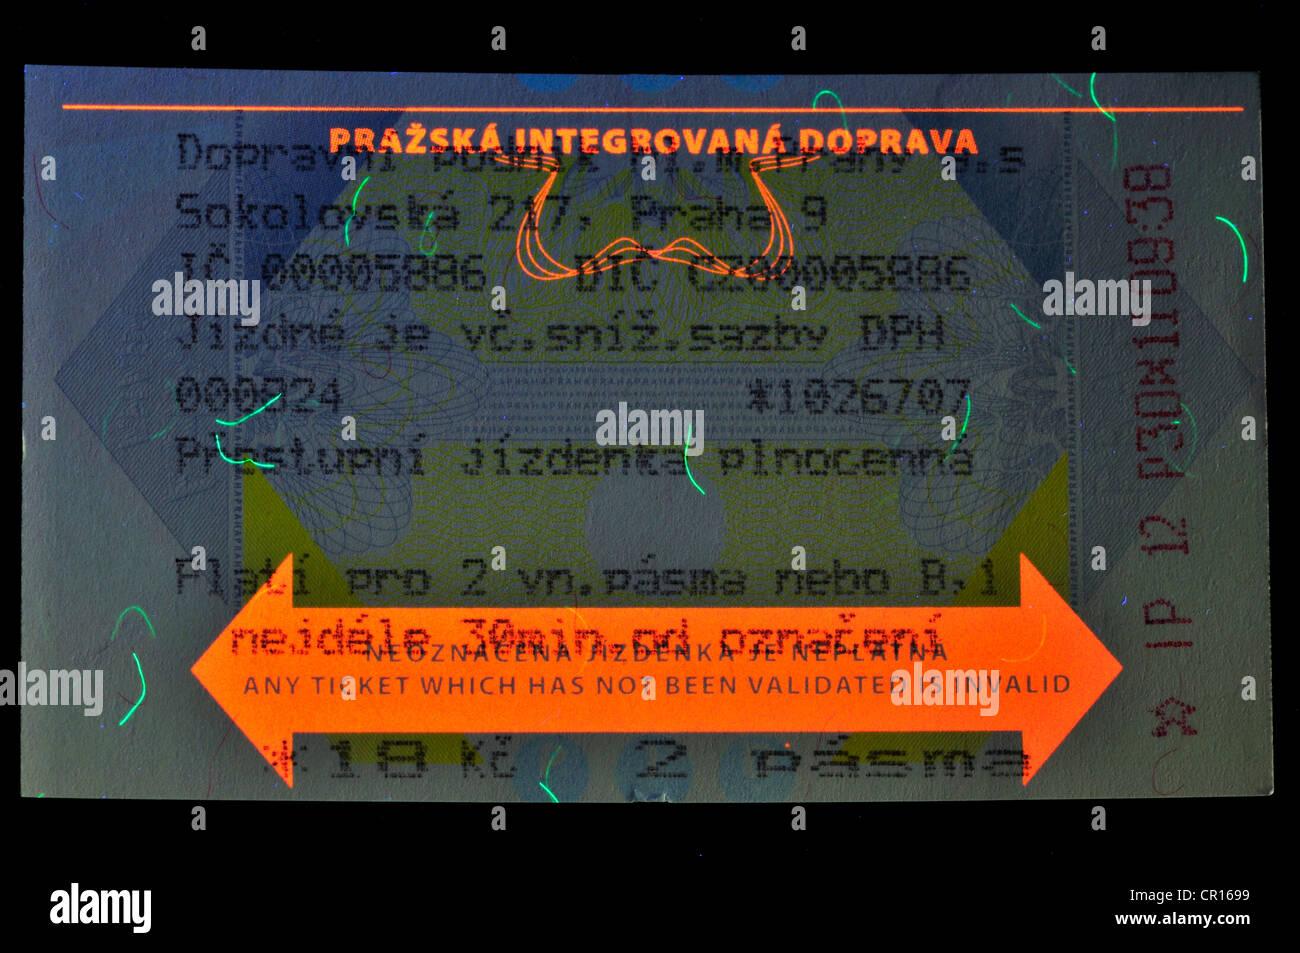 Prague transport ticket showing security features under ultraviolet light - Stock Image